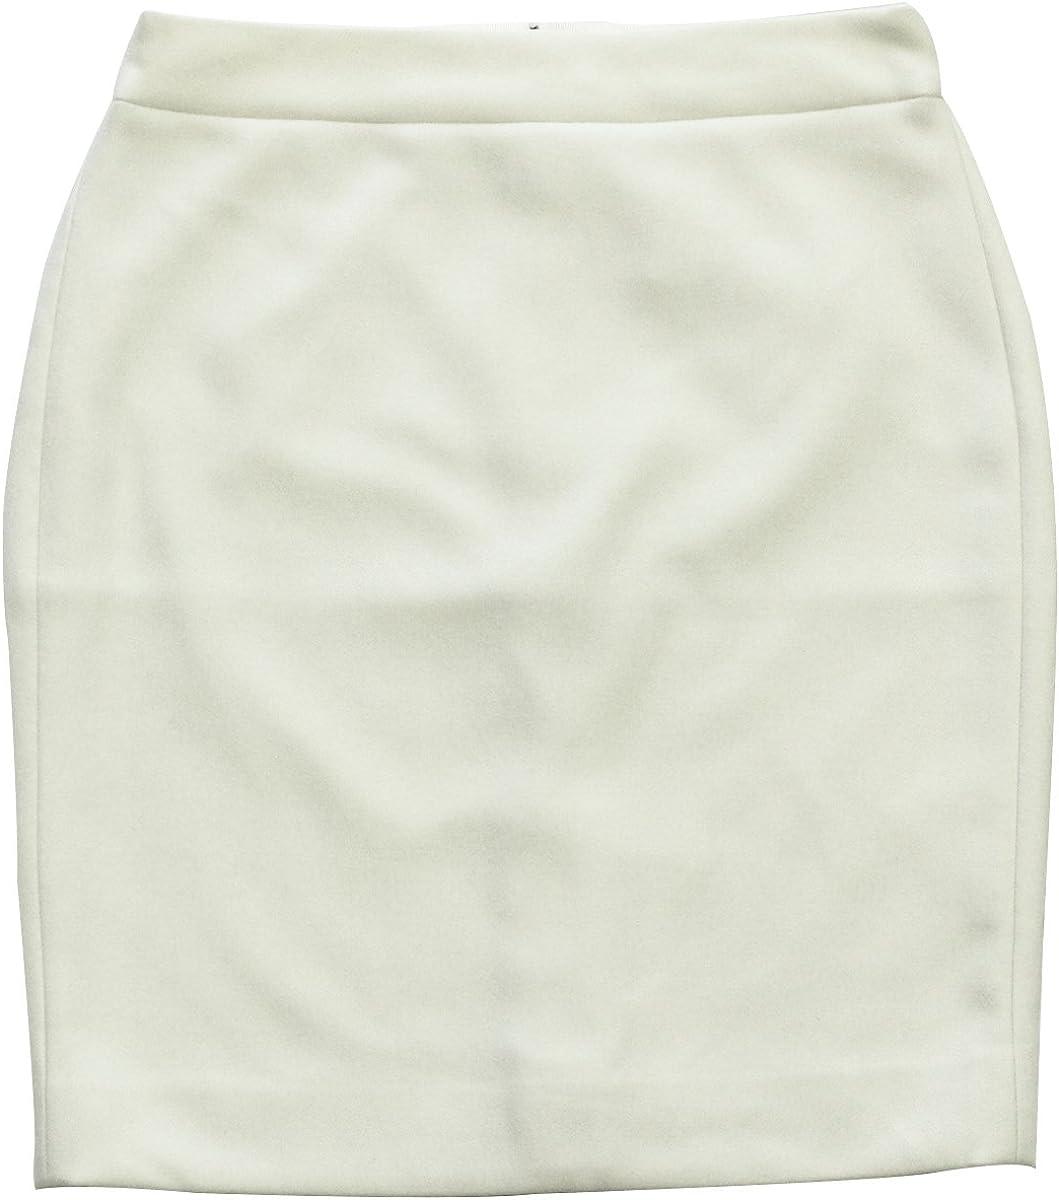 J. Crew Petite No. 2 Pencil Skirt in Double-Serge Wool